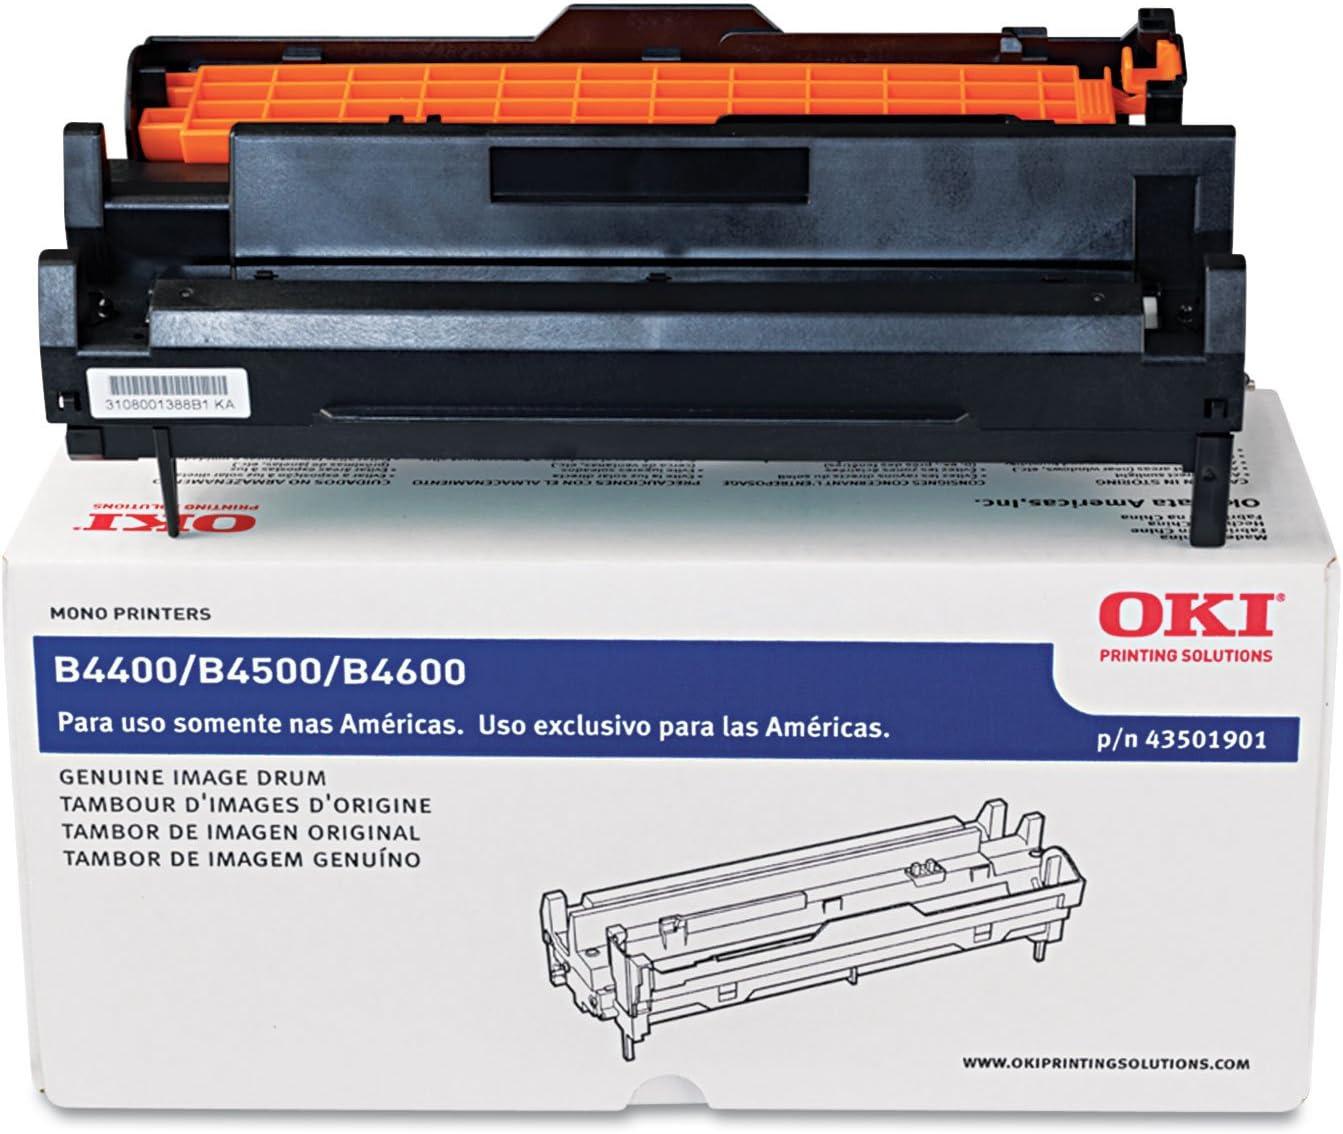 Okidata M41256A-10 41256 256K Dynamic RAM